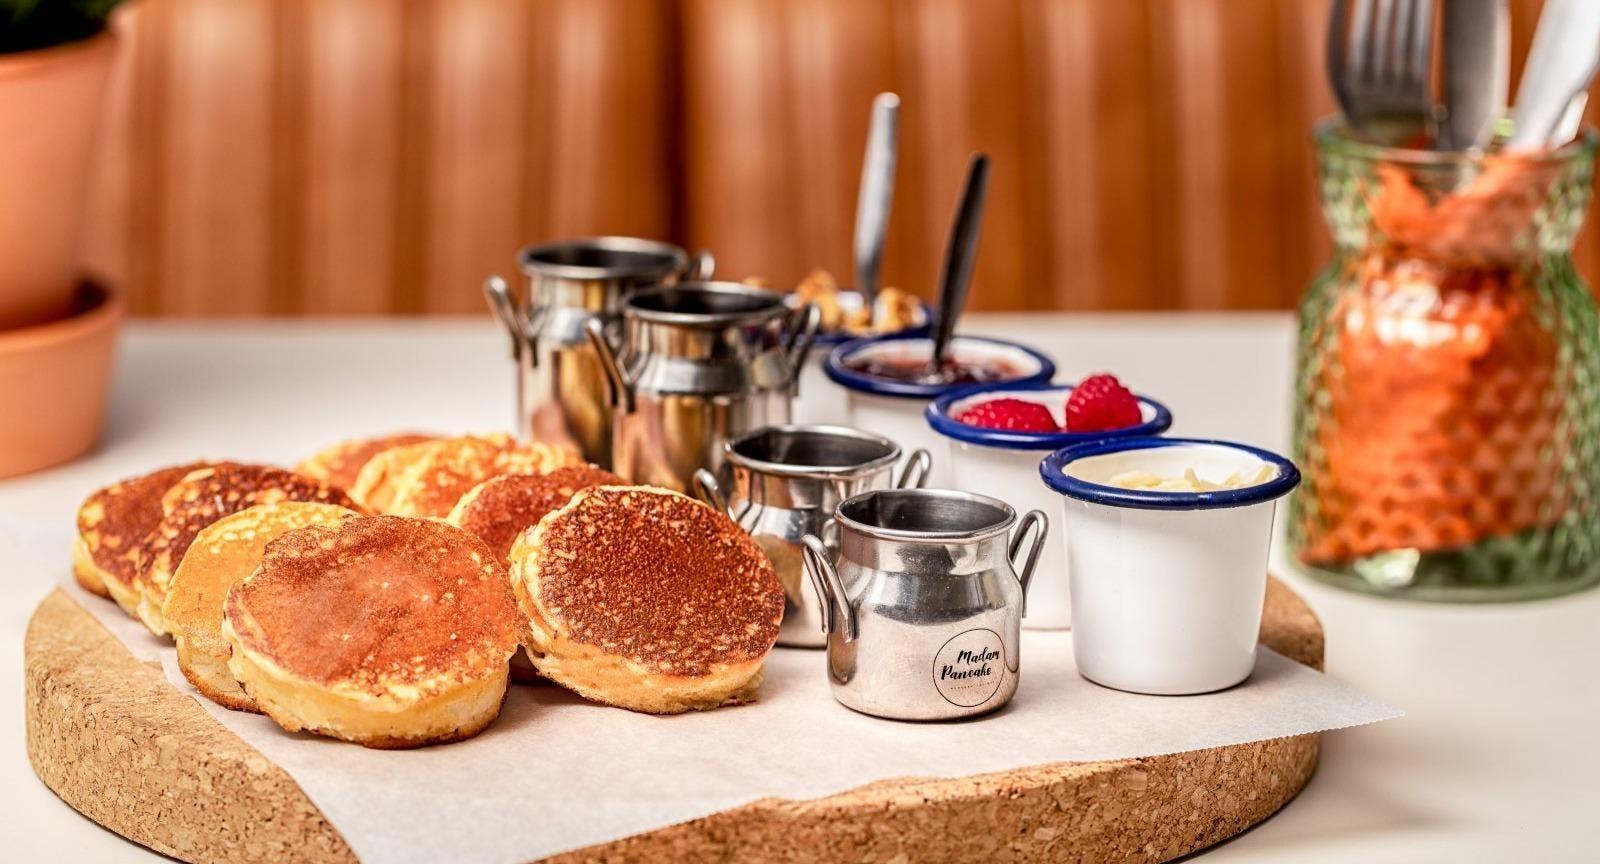 Madam Pancake Amsterdam image 2